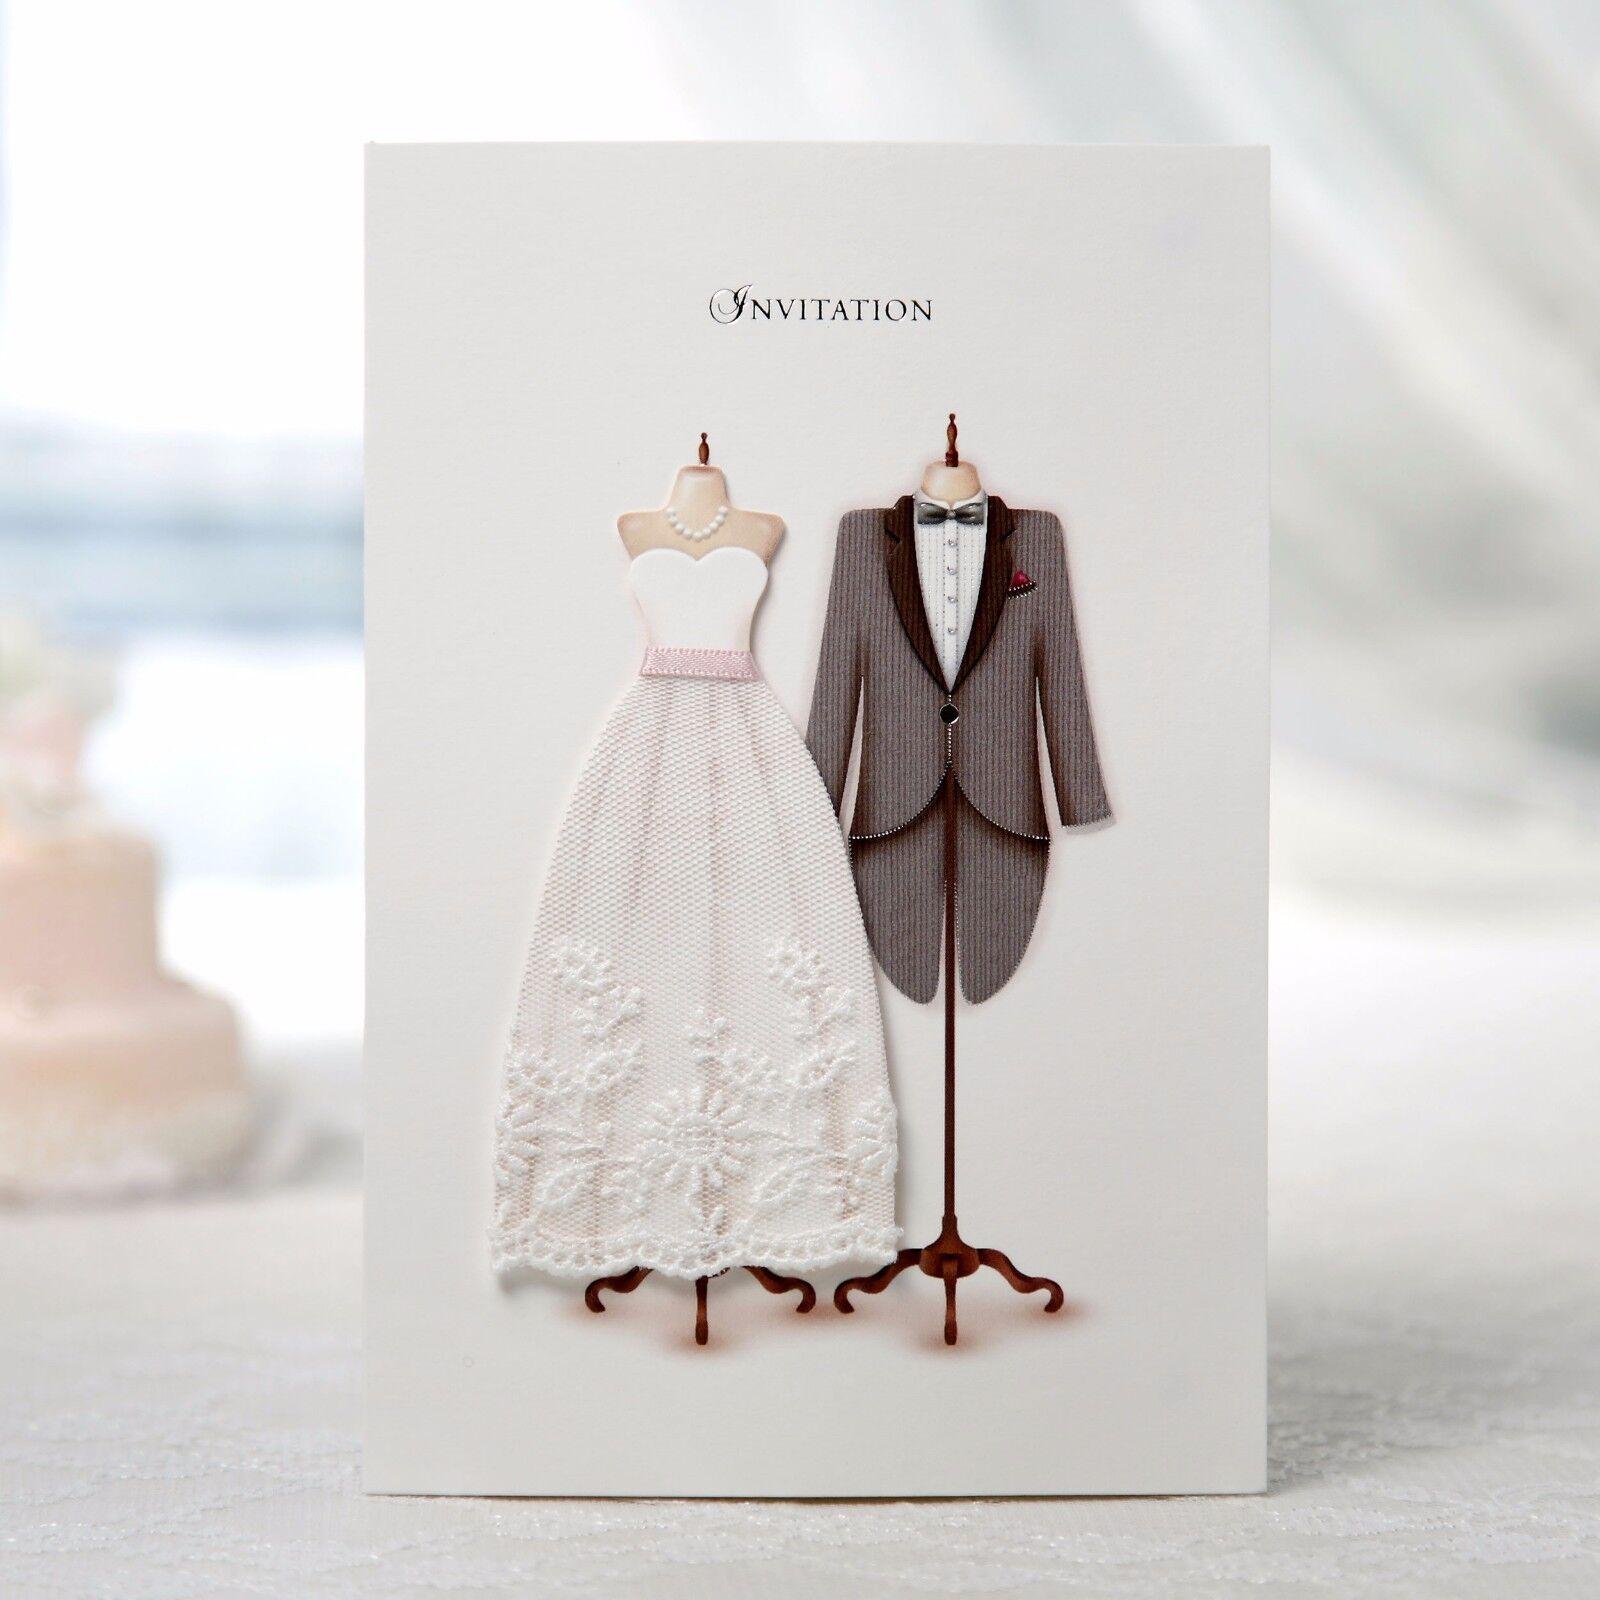 Fabric Wedding Dress Tuxedo Wedding Invitations Unique Wedding Invitation SW3027